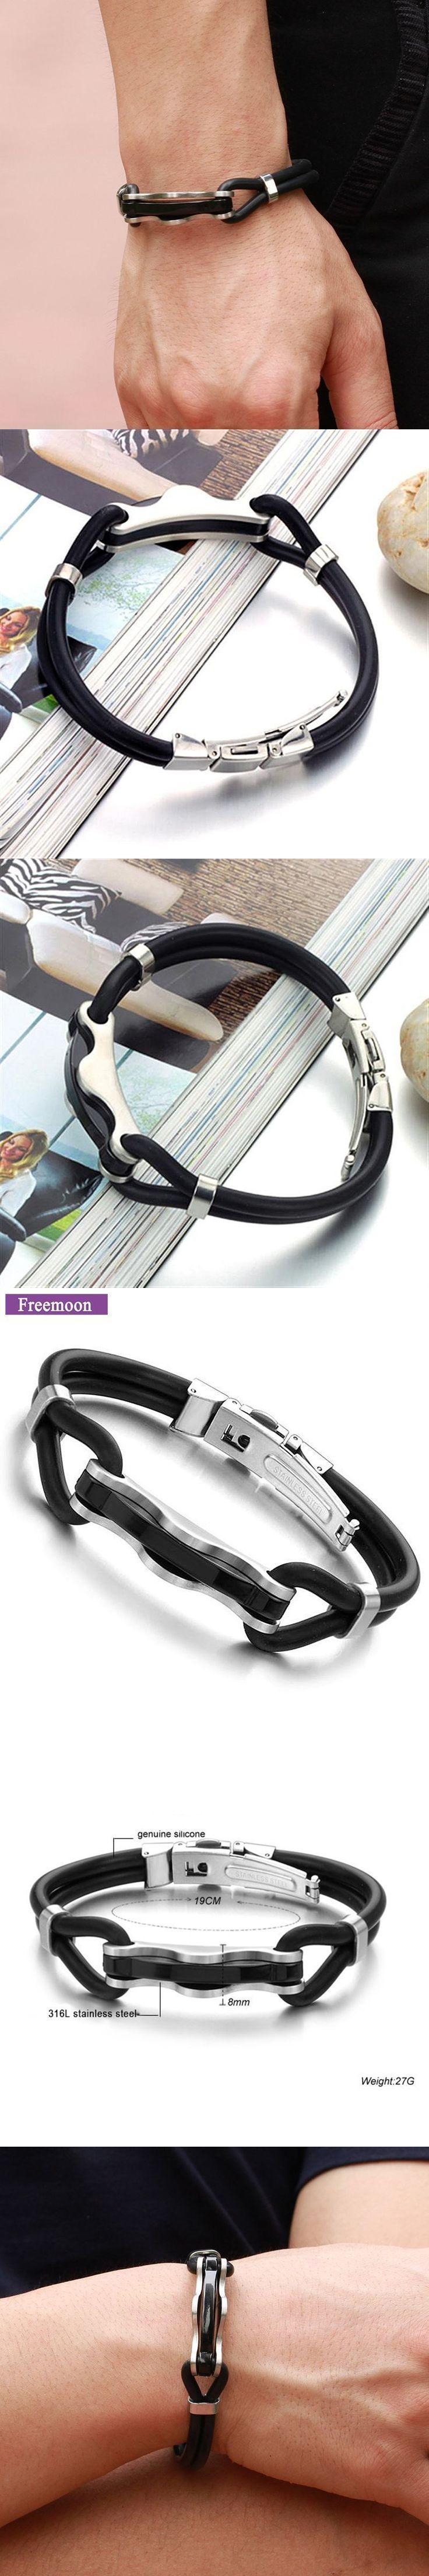 Fashion Jewelry Stainless Steel Anchor Bracelet Black Leather Charm Bracelets Men Jewelry Party Gift #men'sjewelry